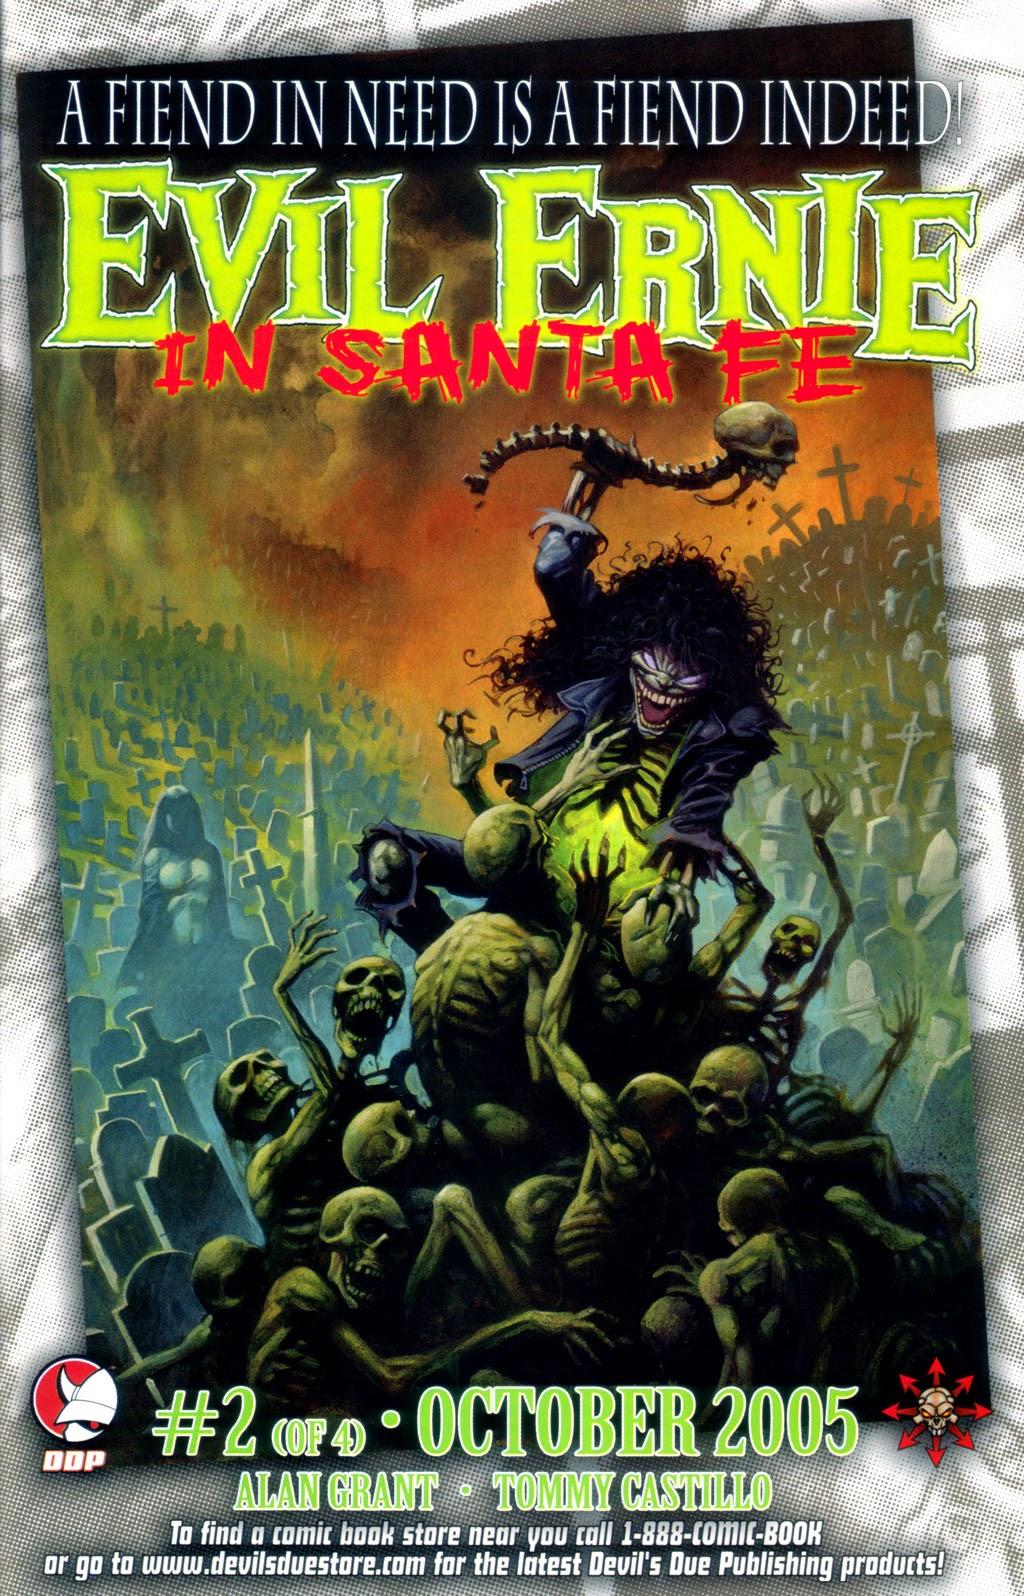 Read online Evil Ernie in Santa Fe comic -  Issue #1 - 24